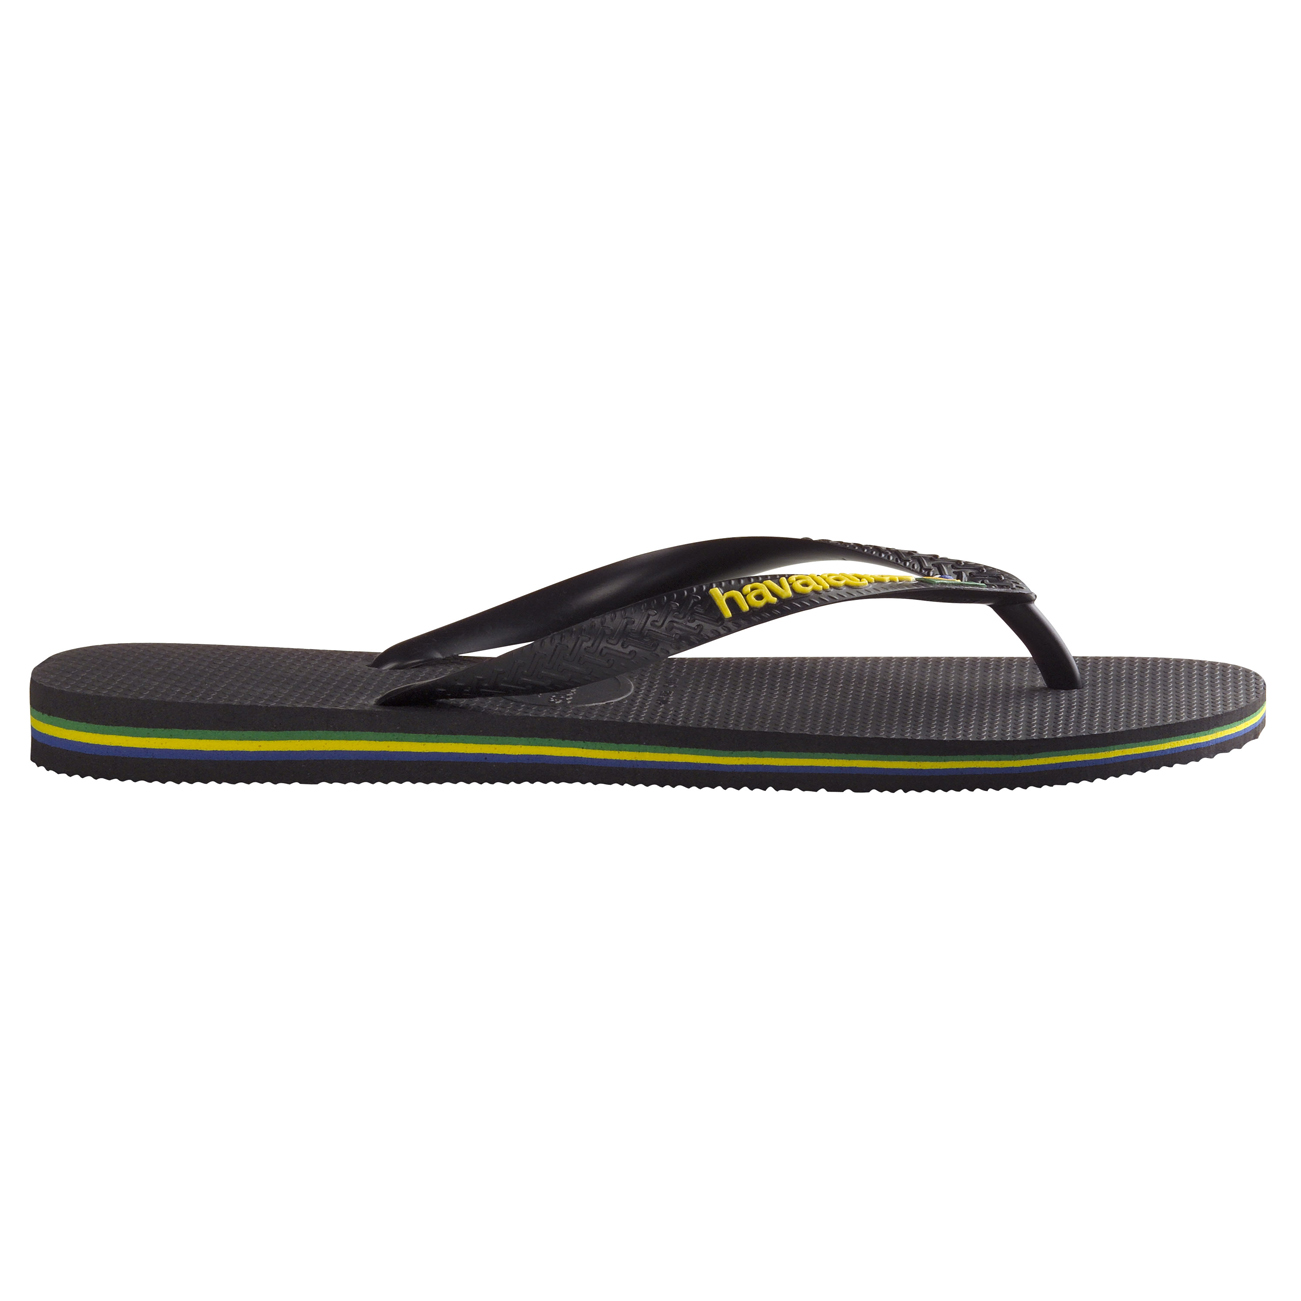 84a08ae4efde91 Unisex Kids Havaianas Brasil Logo Slip On Beach Holiday Flip Flops All Sizes